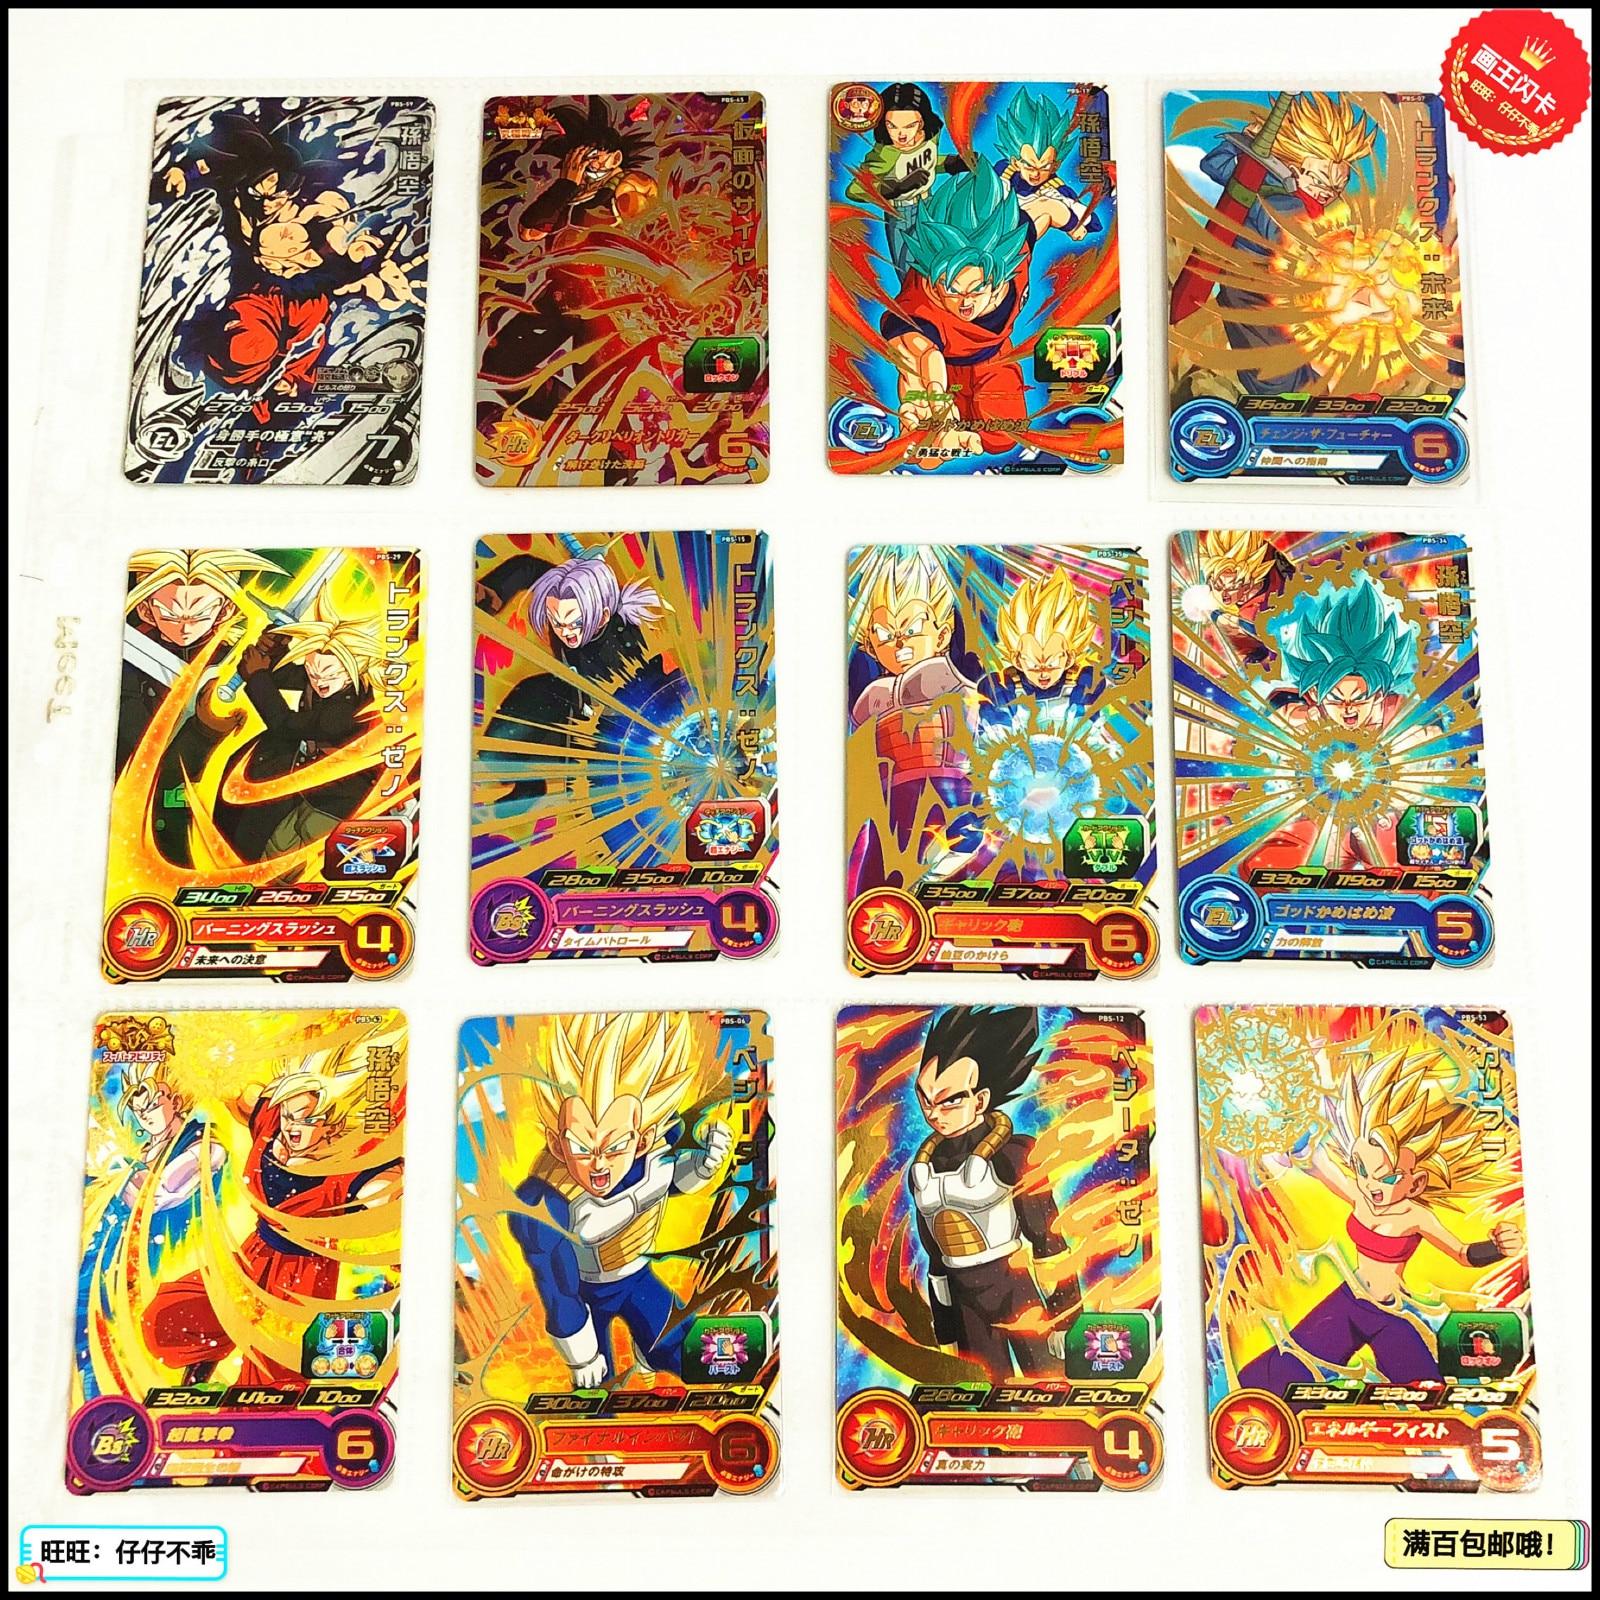 Japan Original Dragon Ball Hero PBS God Super Saiyan Goku Burdock Toys Hobbies Collectibles Game Collection Anime Cards